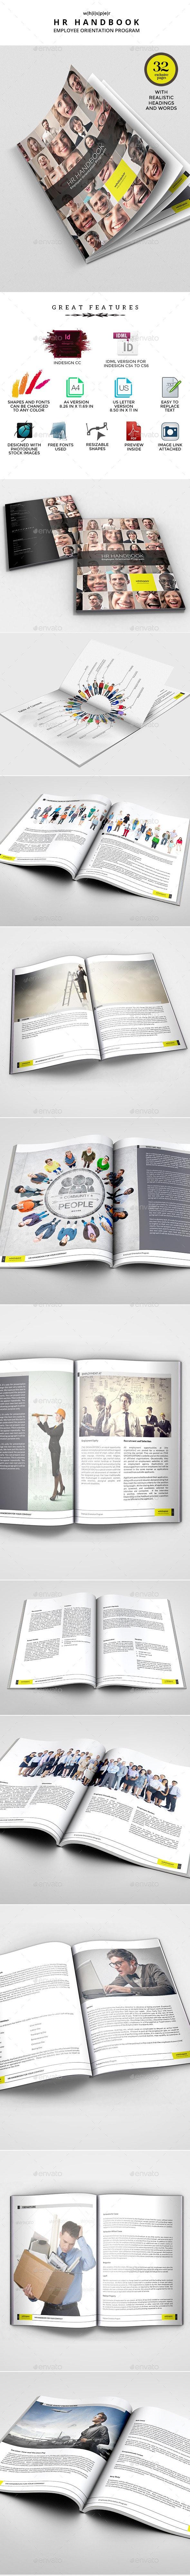 HR and Employee Handbook - Miscellaneous Print Templates